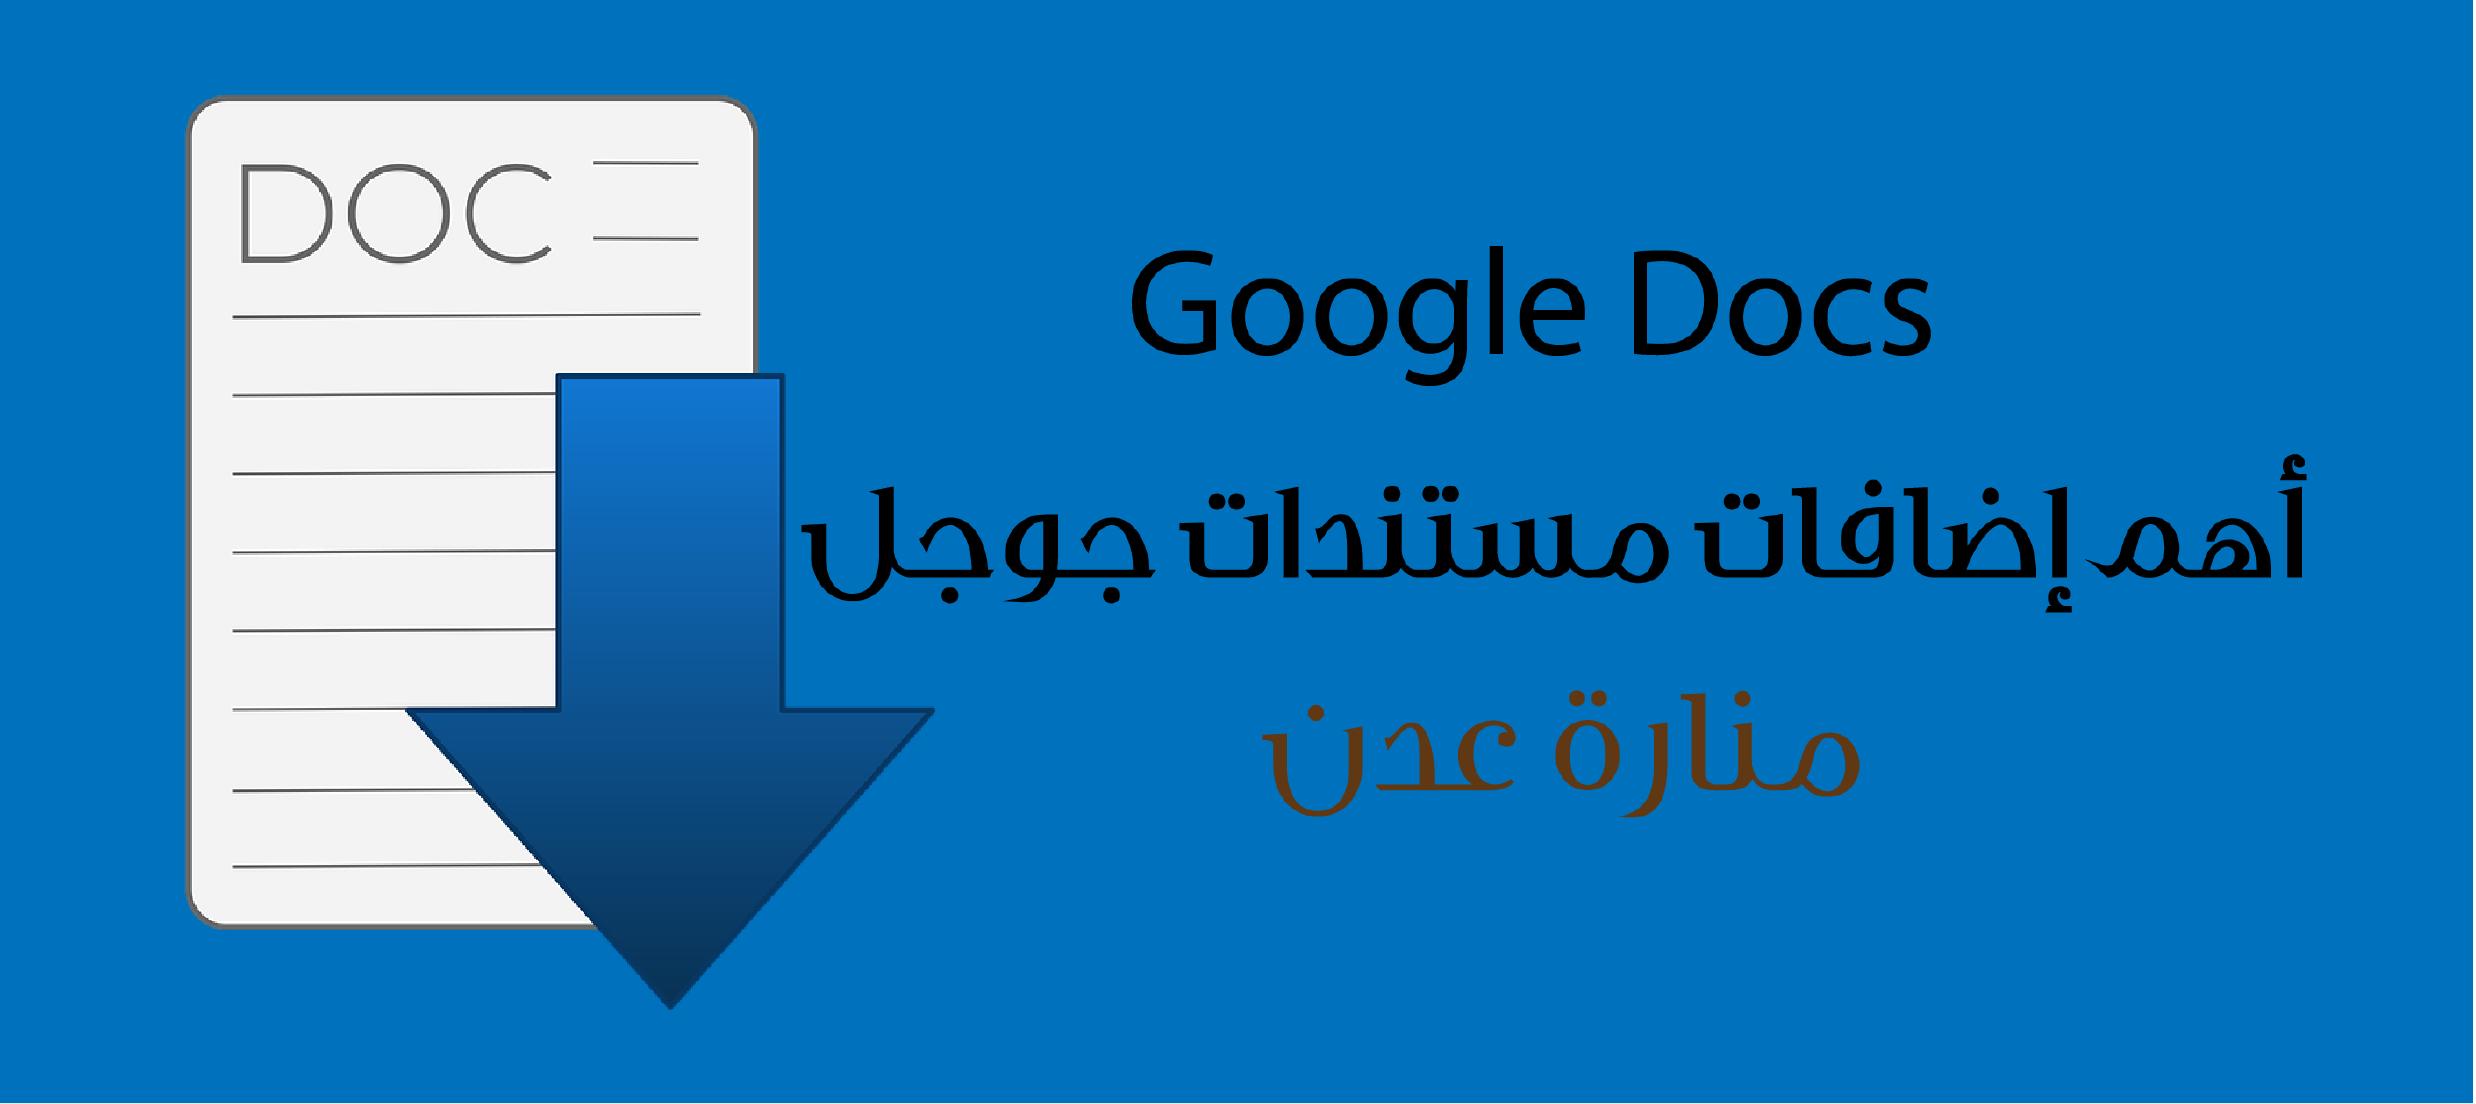 Pin By منارة عدن التقنية On جوجل Tech Company Logos Google Google Docs